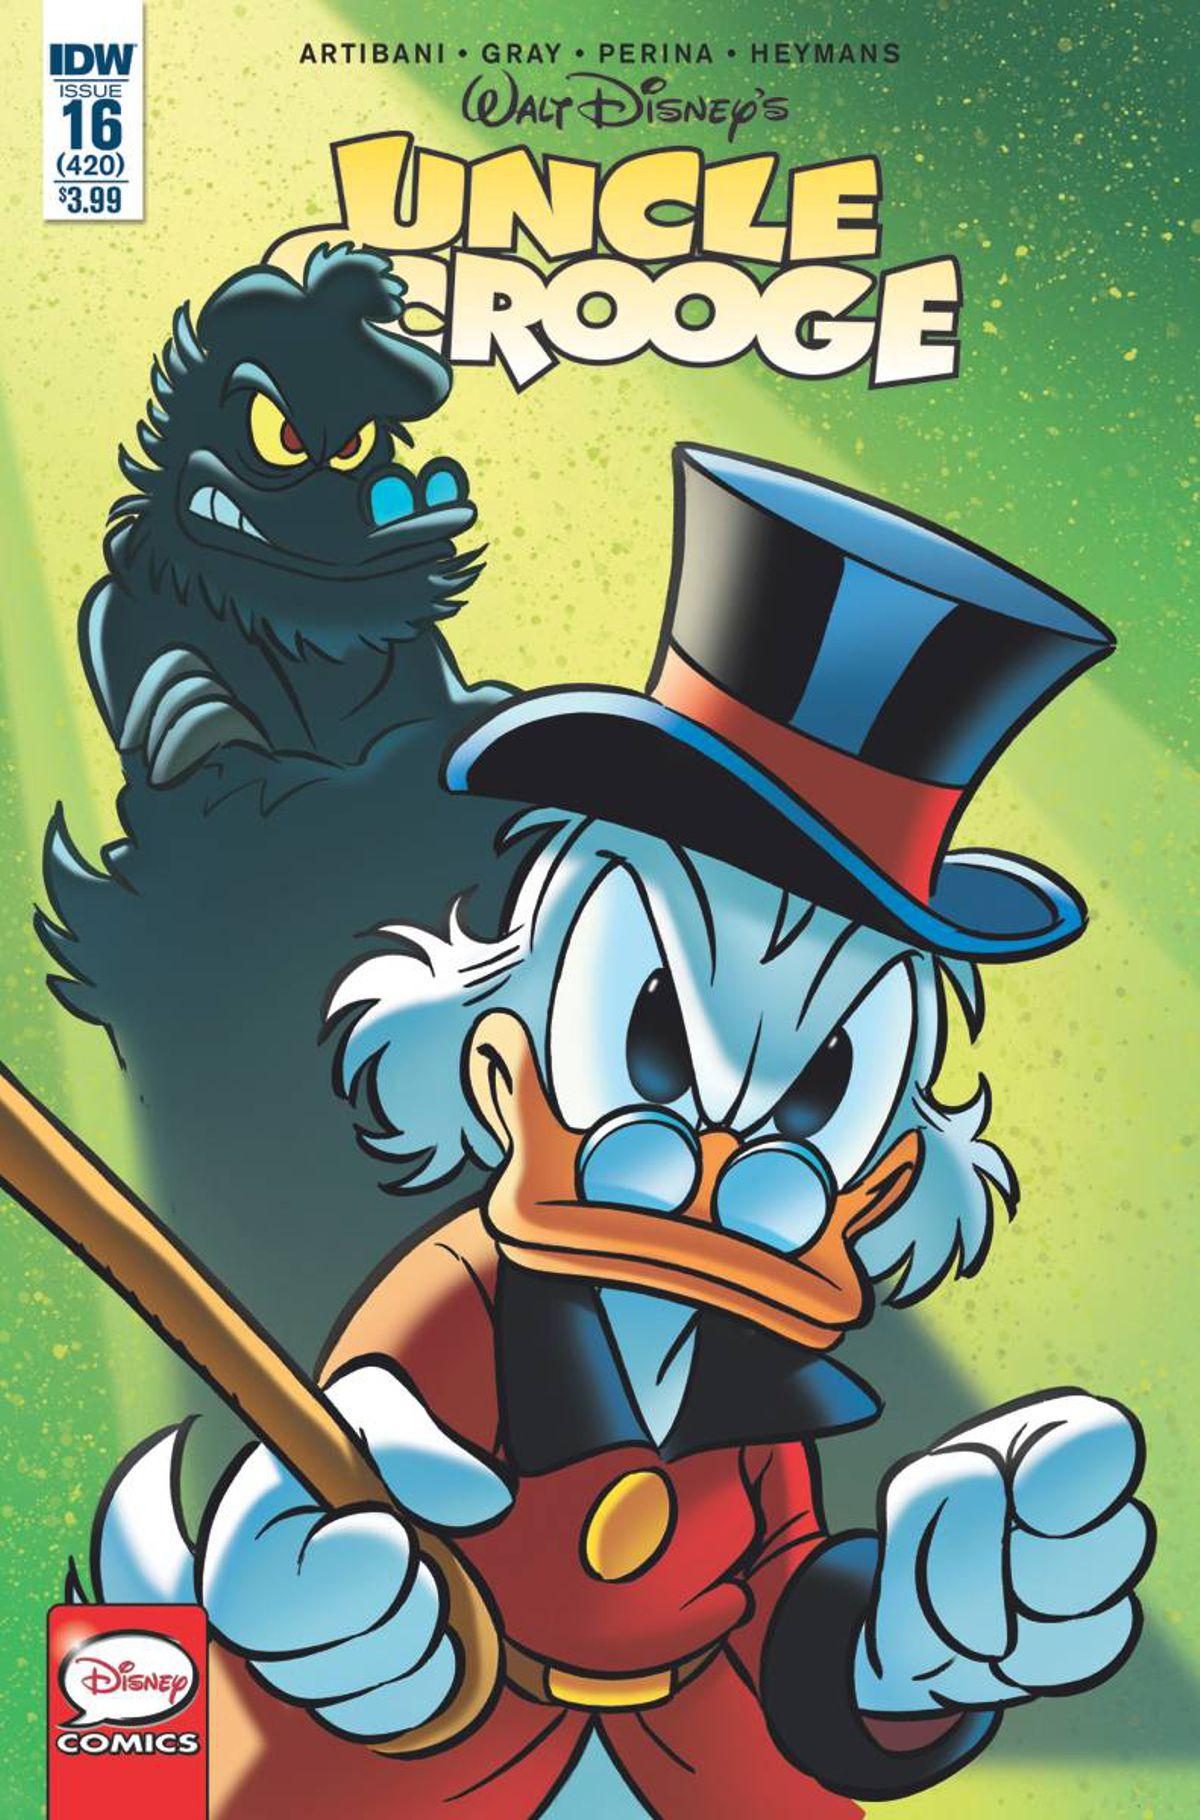 Uncle Scrooge #16 (IDW)